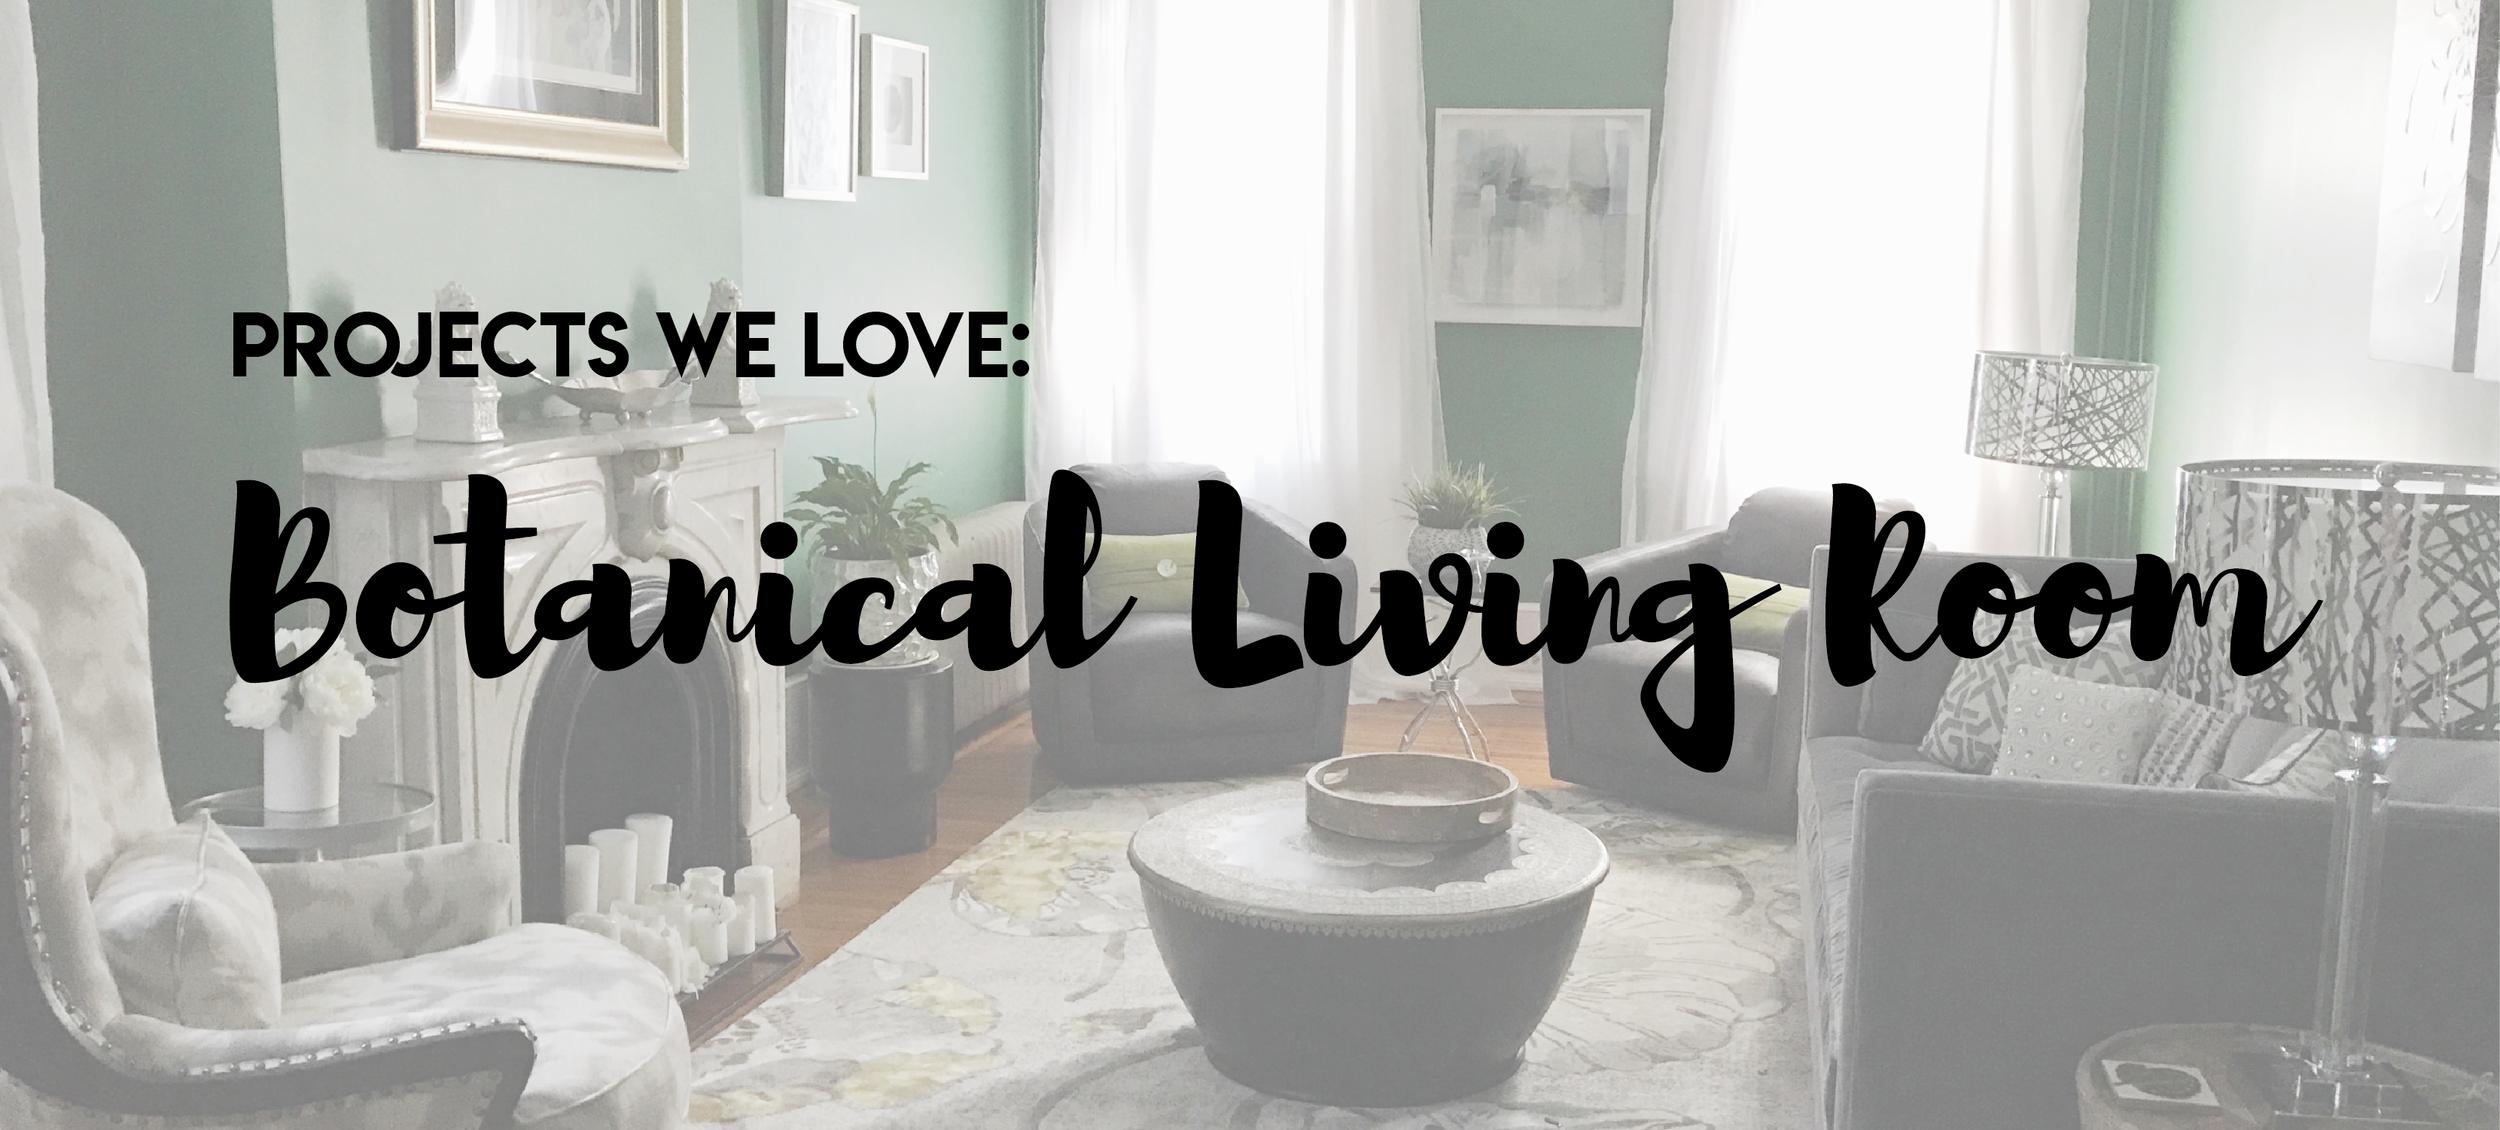 Botanical Living Room.png